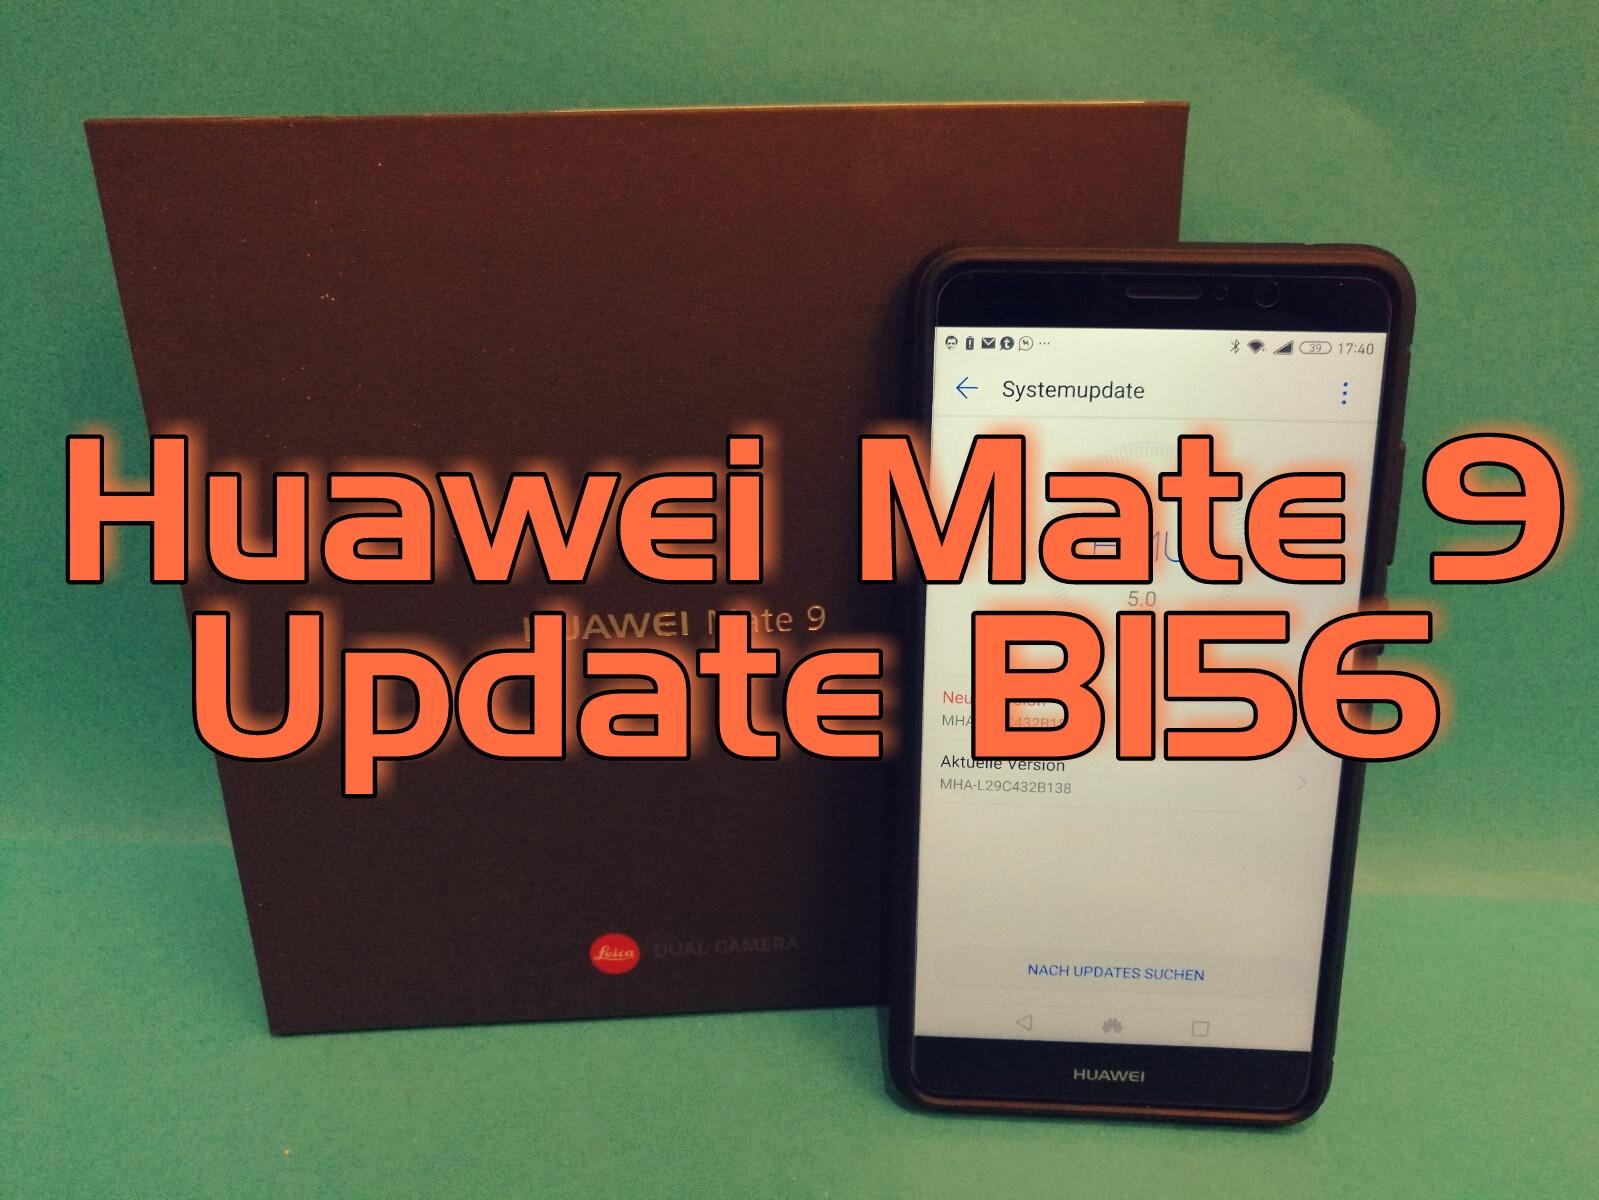 Huawei Mate 9 Update B156